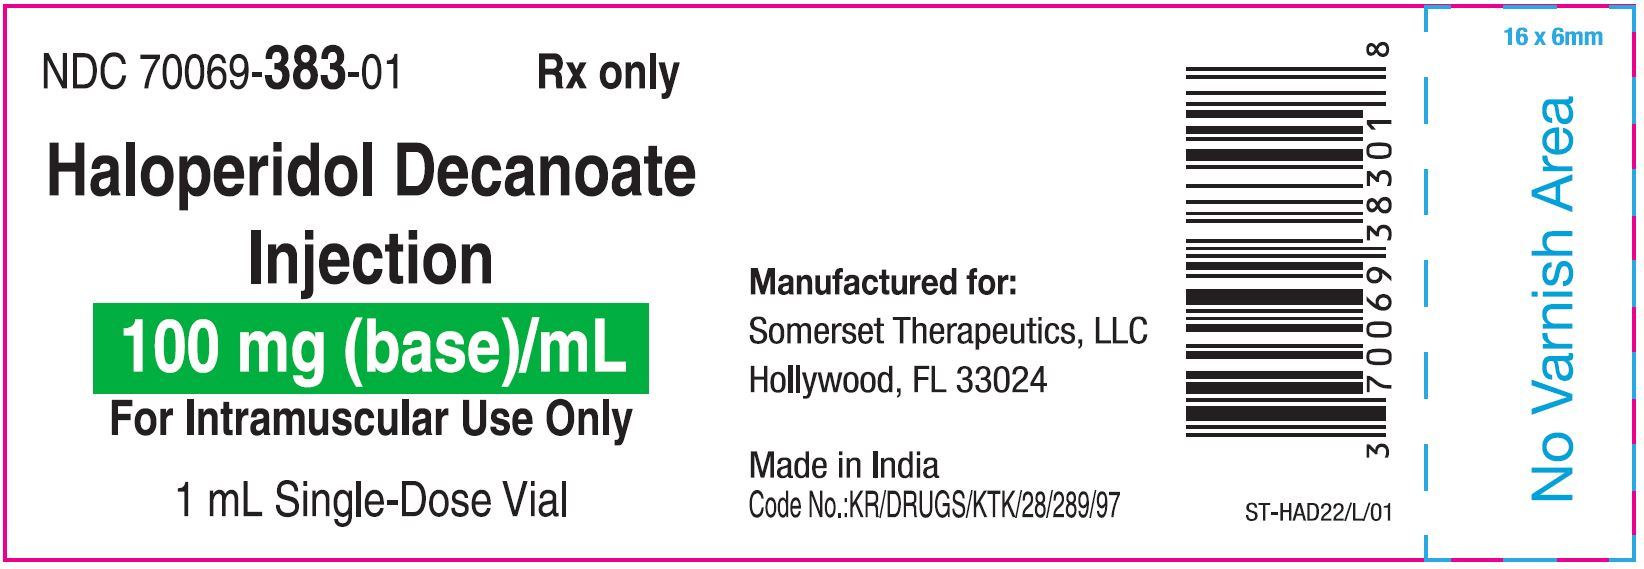 vial label 1 ml